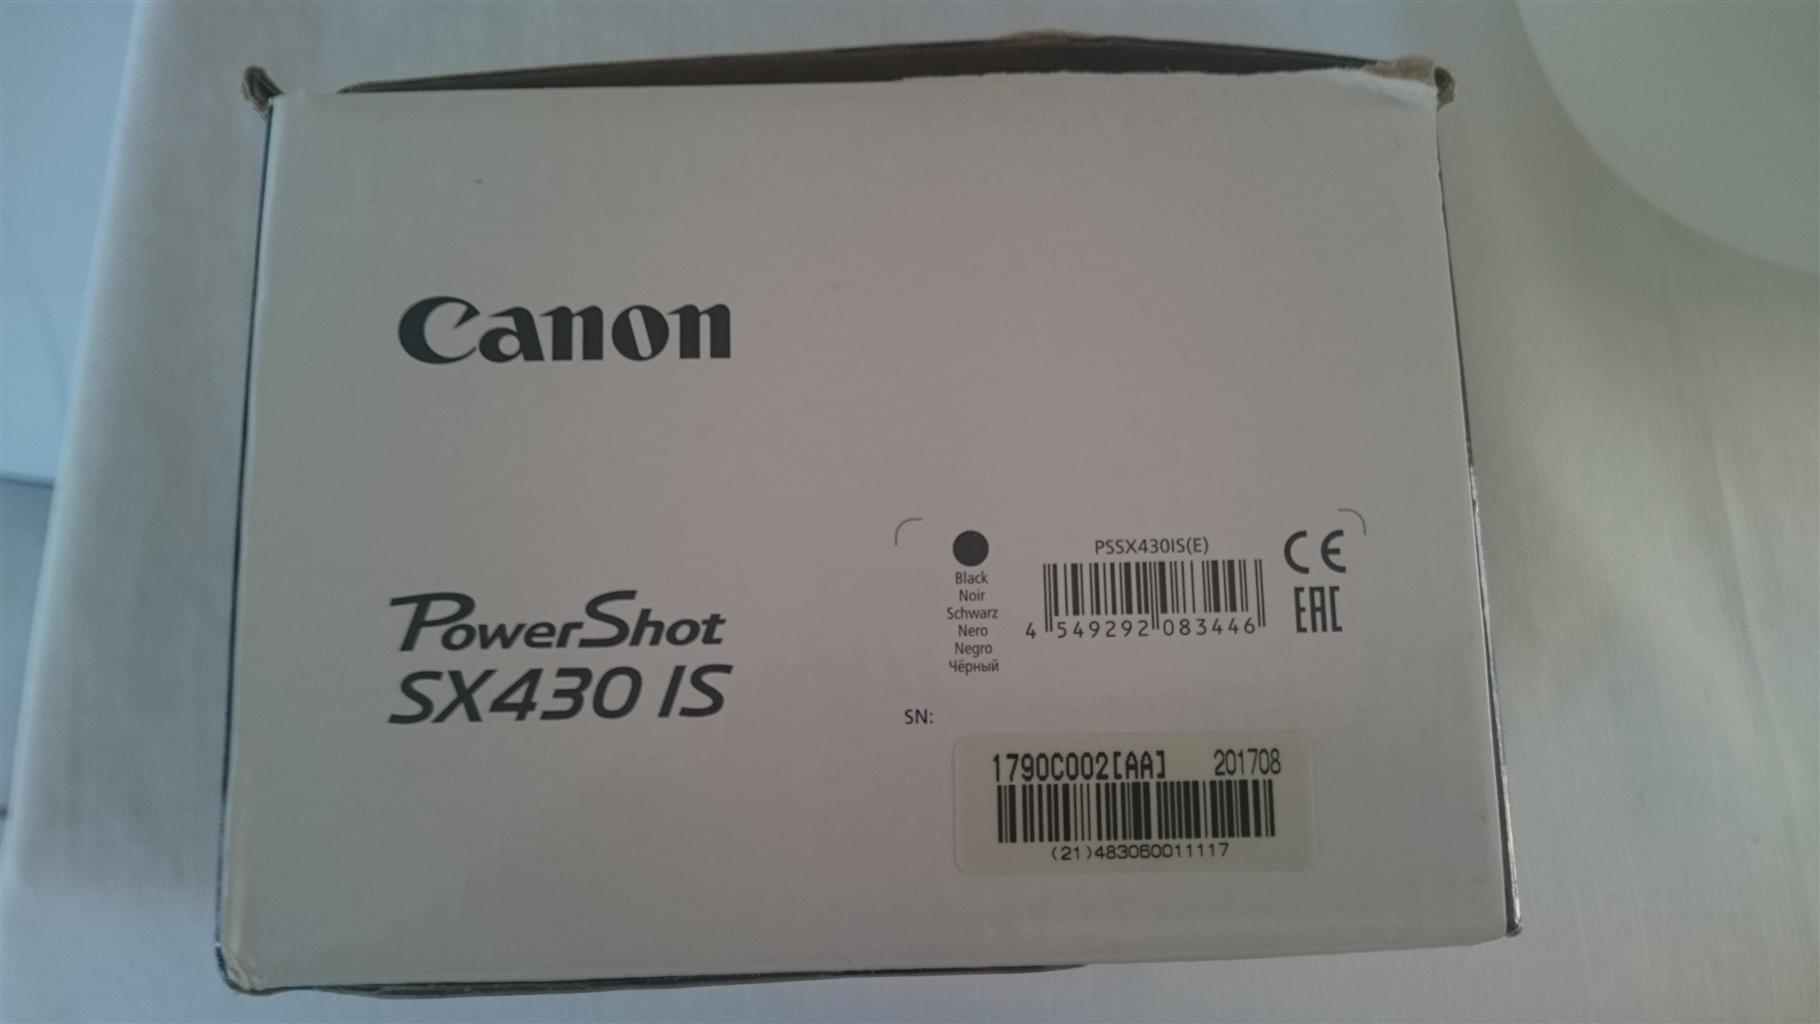 CANON POWERSHOT SX 430